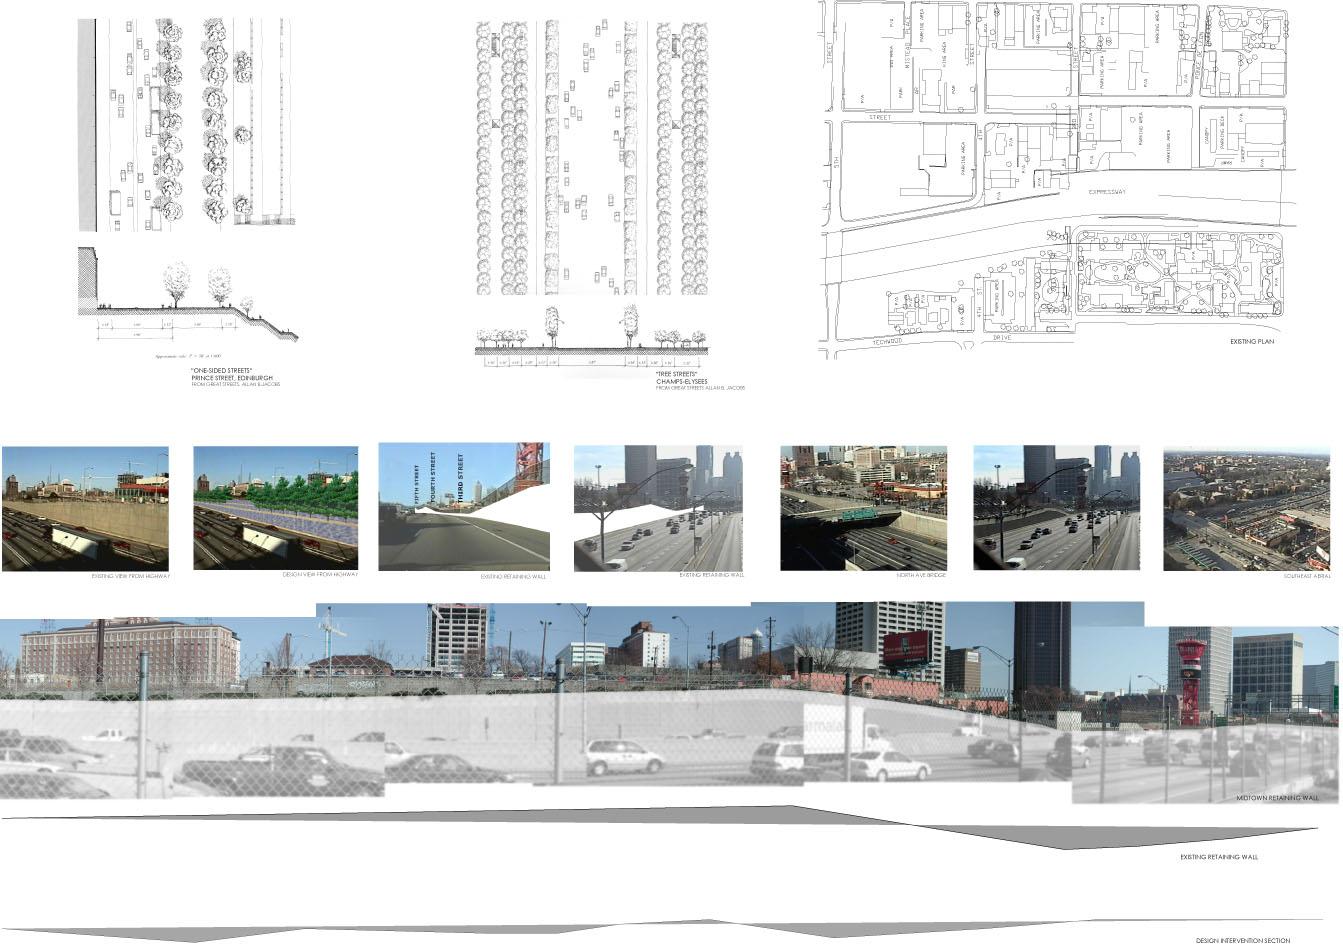 Conosciuto architecture portfolio layout - Gse.bookbinder.co UW18